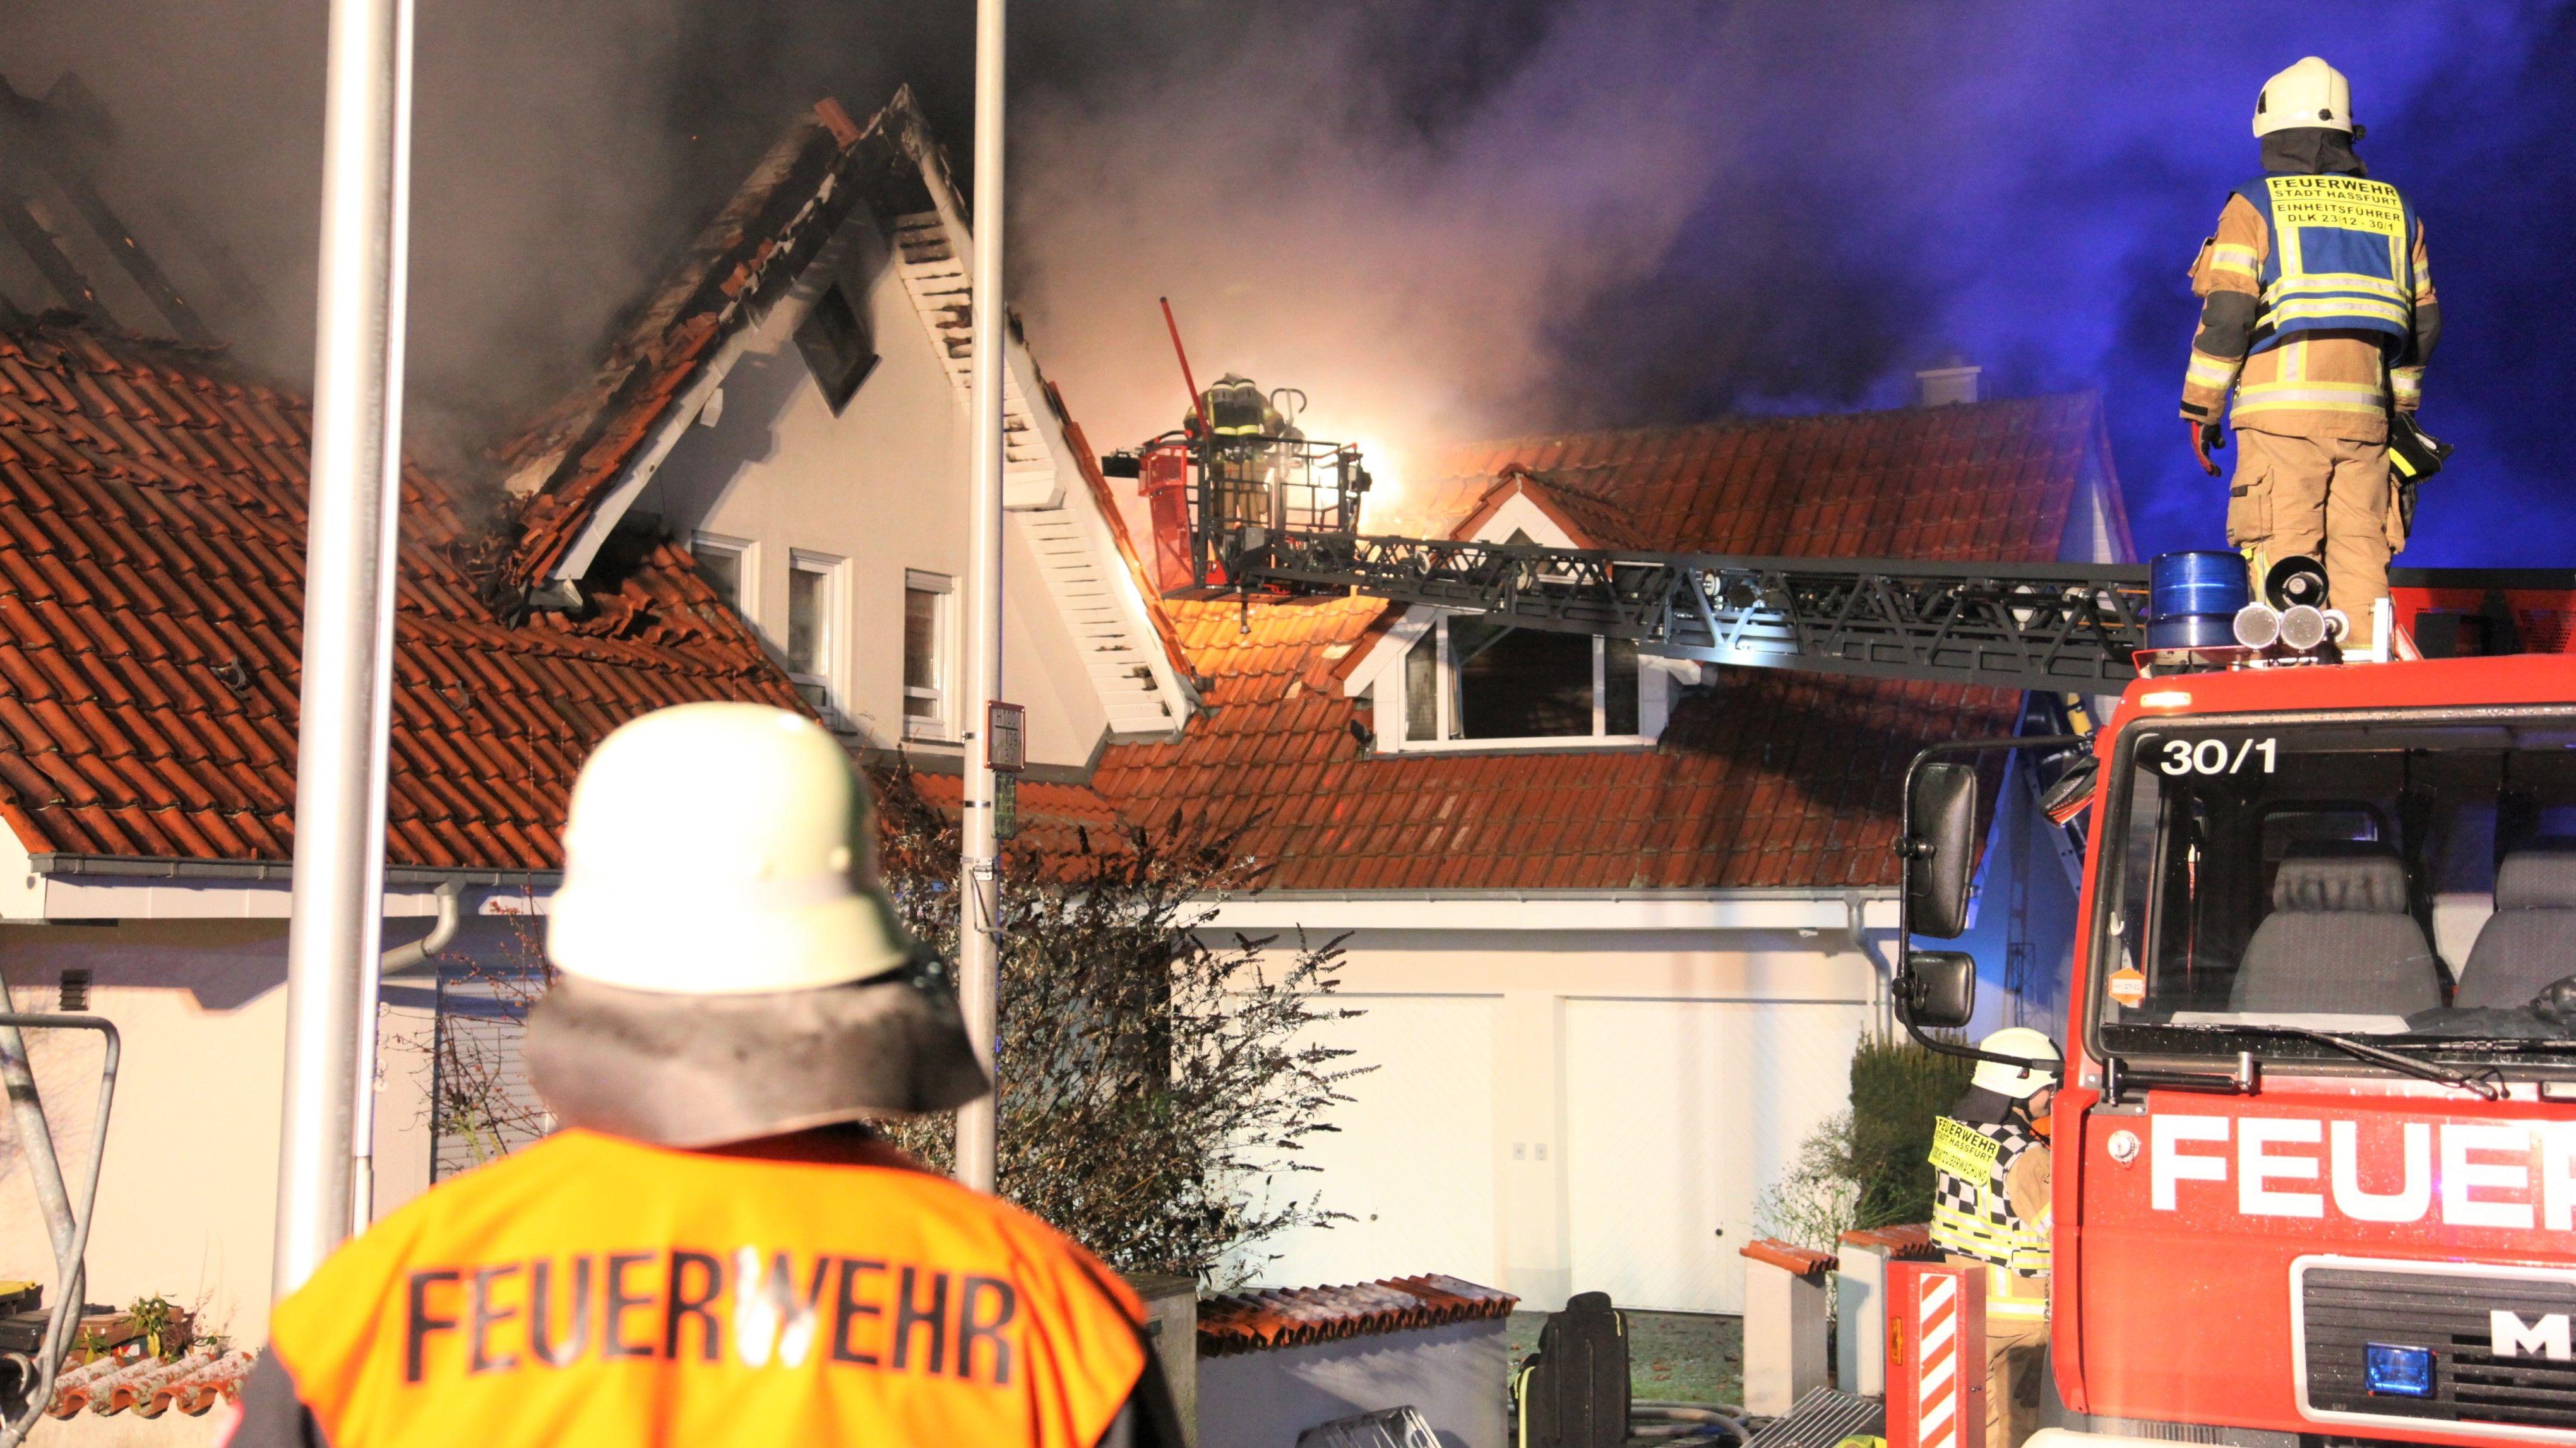 Dachstuhl in Haßfurt in Flammen aufgegangen